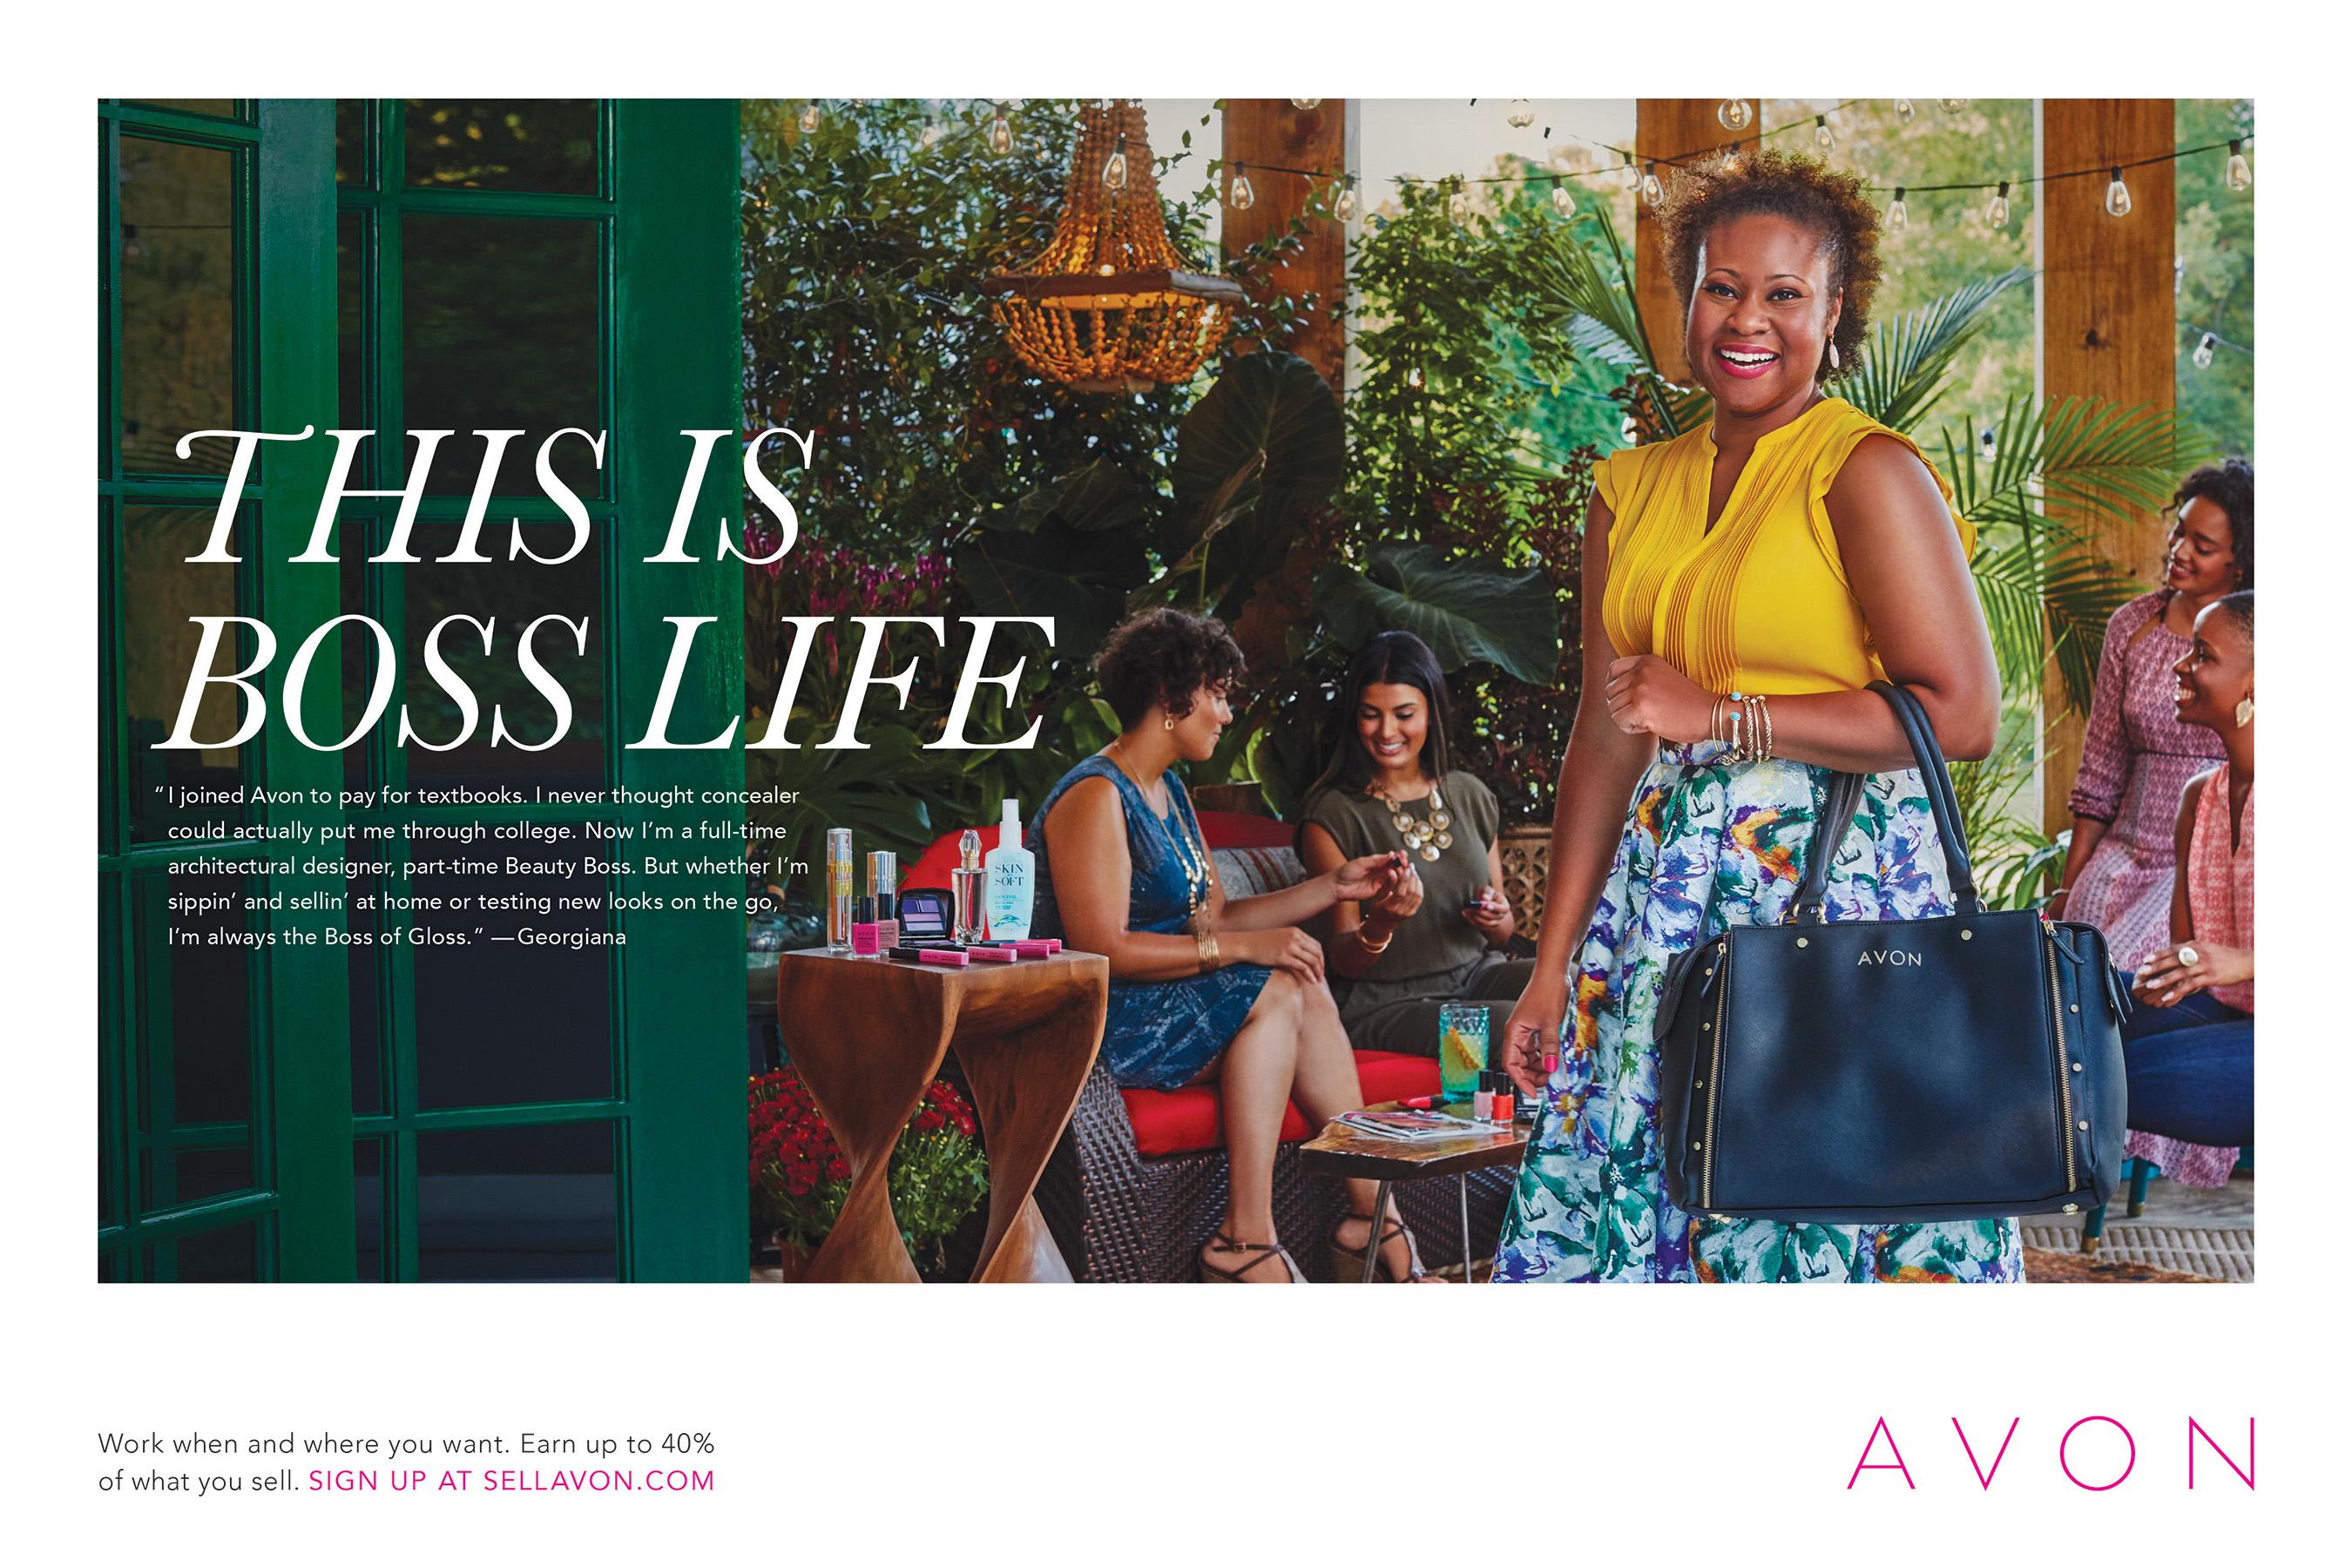 this-is-boss-life-print-advertising-featuring-avon-representative-georgiana